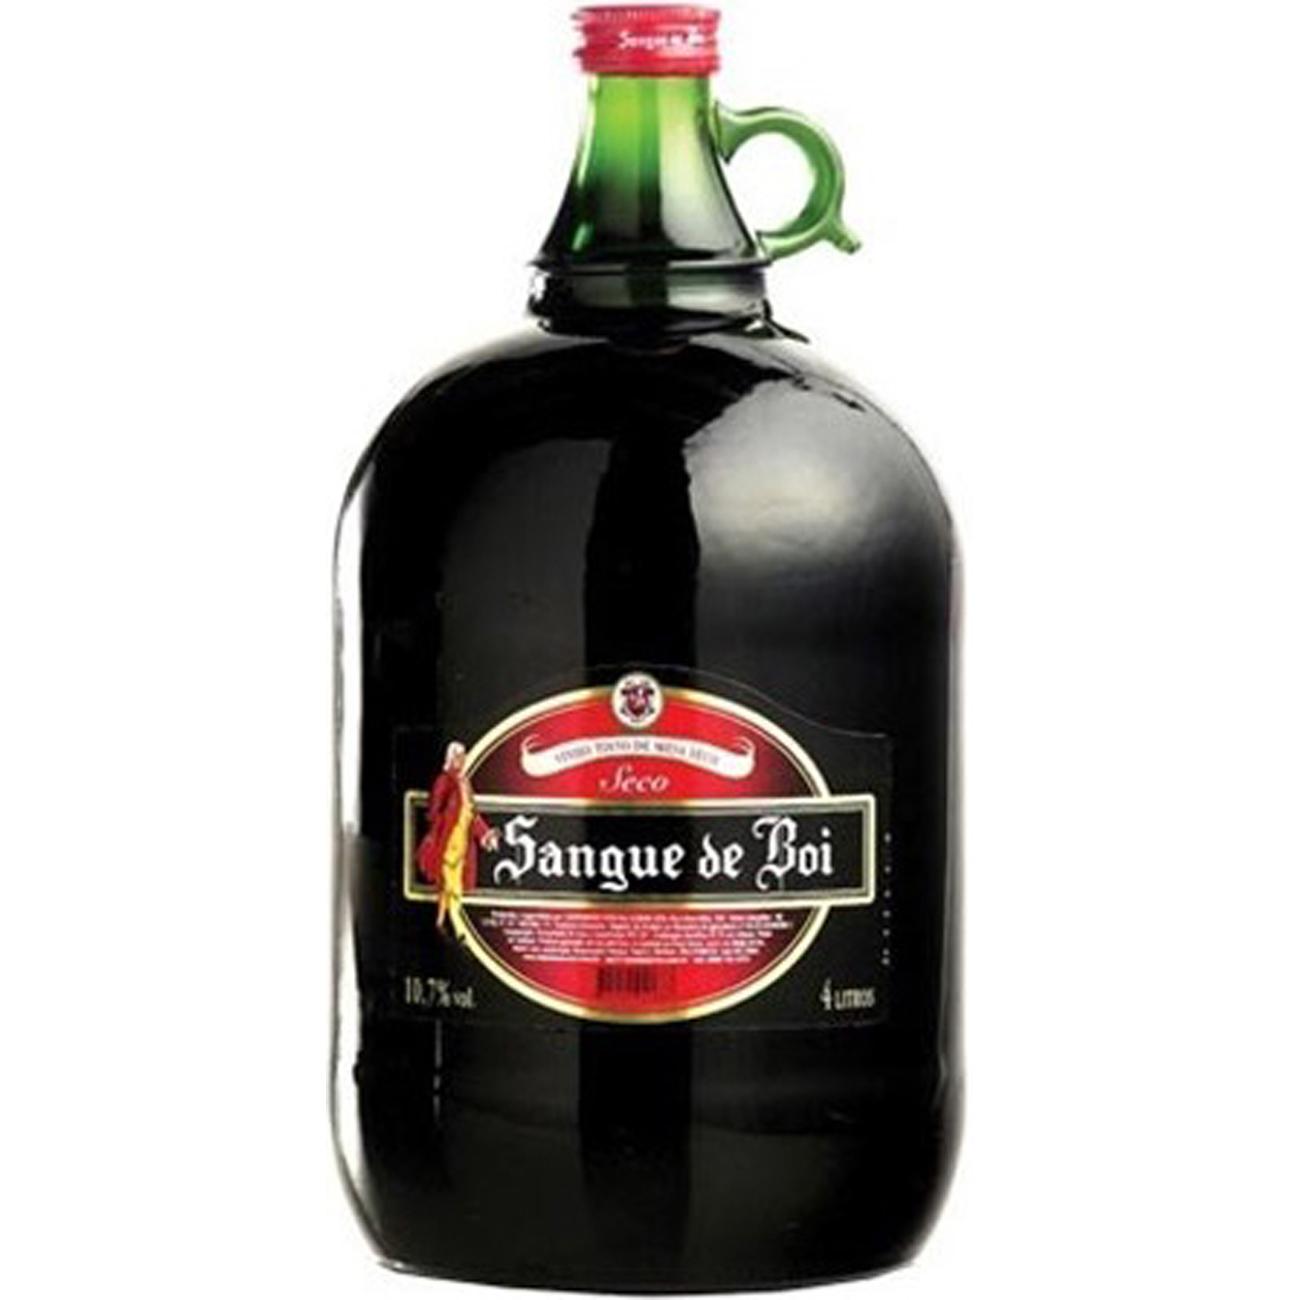 Vinho Sangue de Boi 4L Ttsc